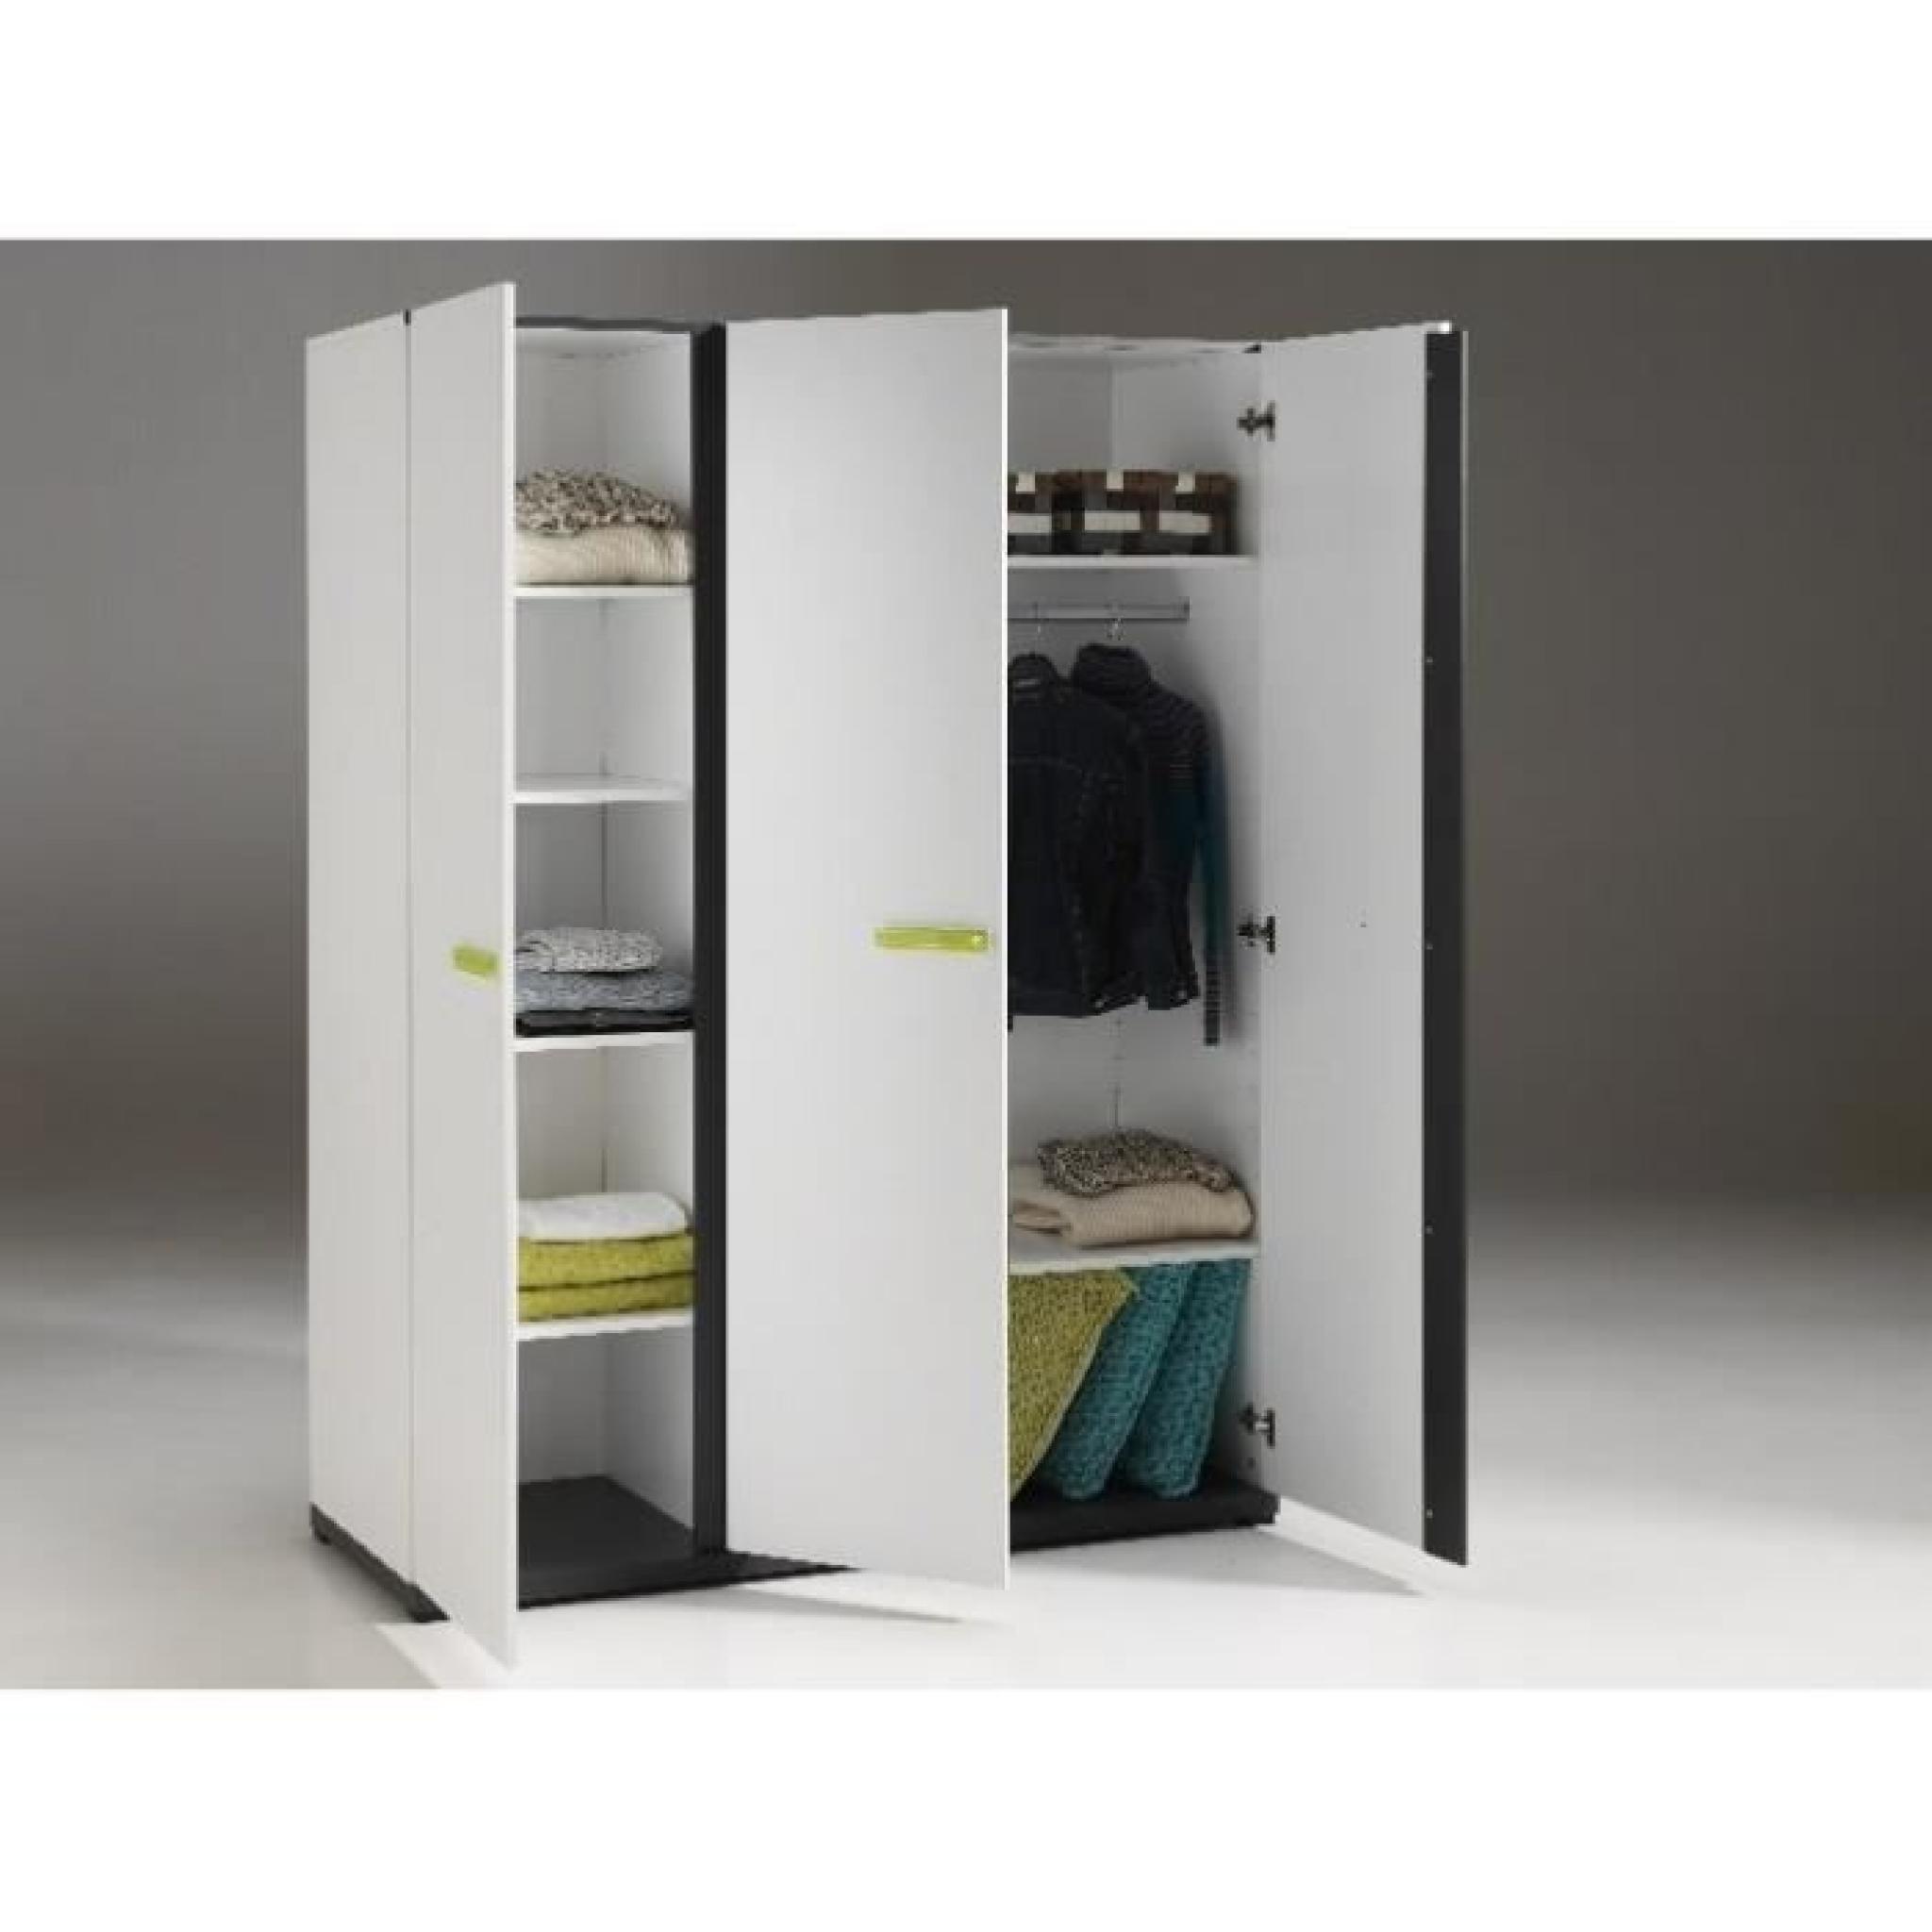 Armoire penderie NIXON 3 portes blanche - Achat/Vente armoire de ...